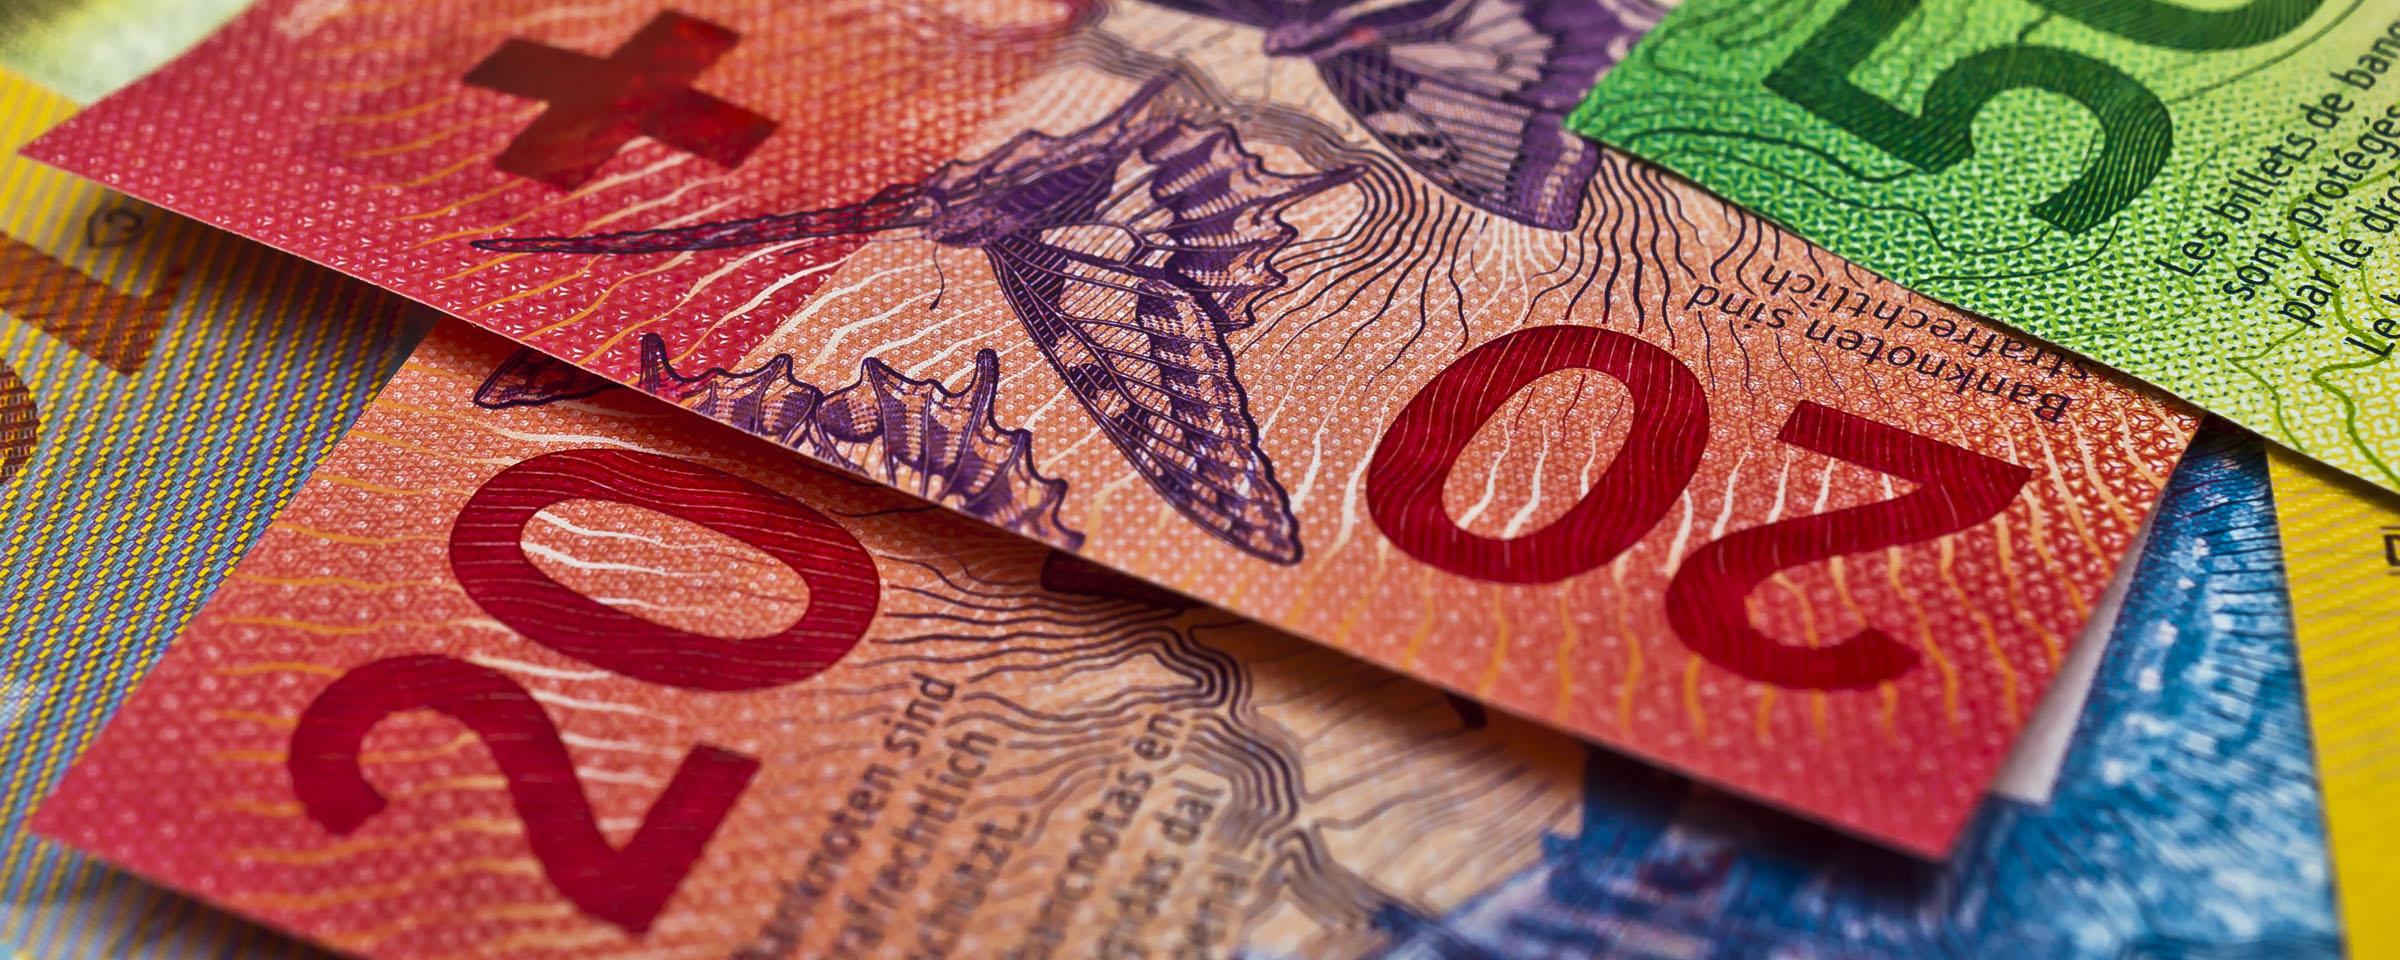 Privatkredit ab 4,9% von unserer Partnerin cashgate – BEKB